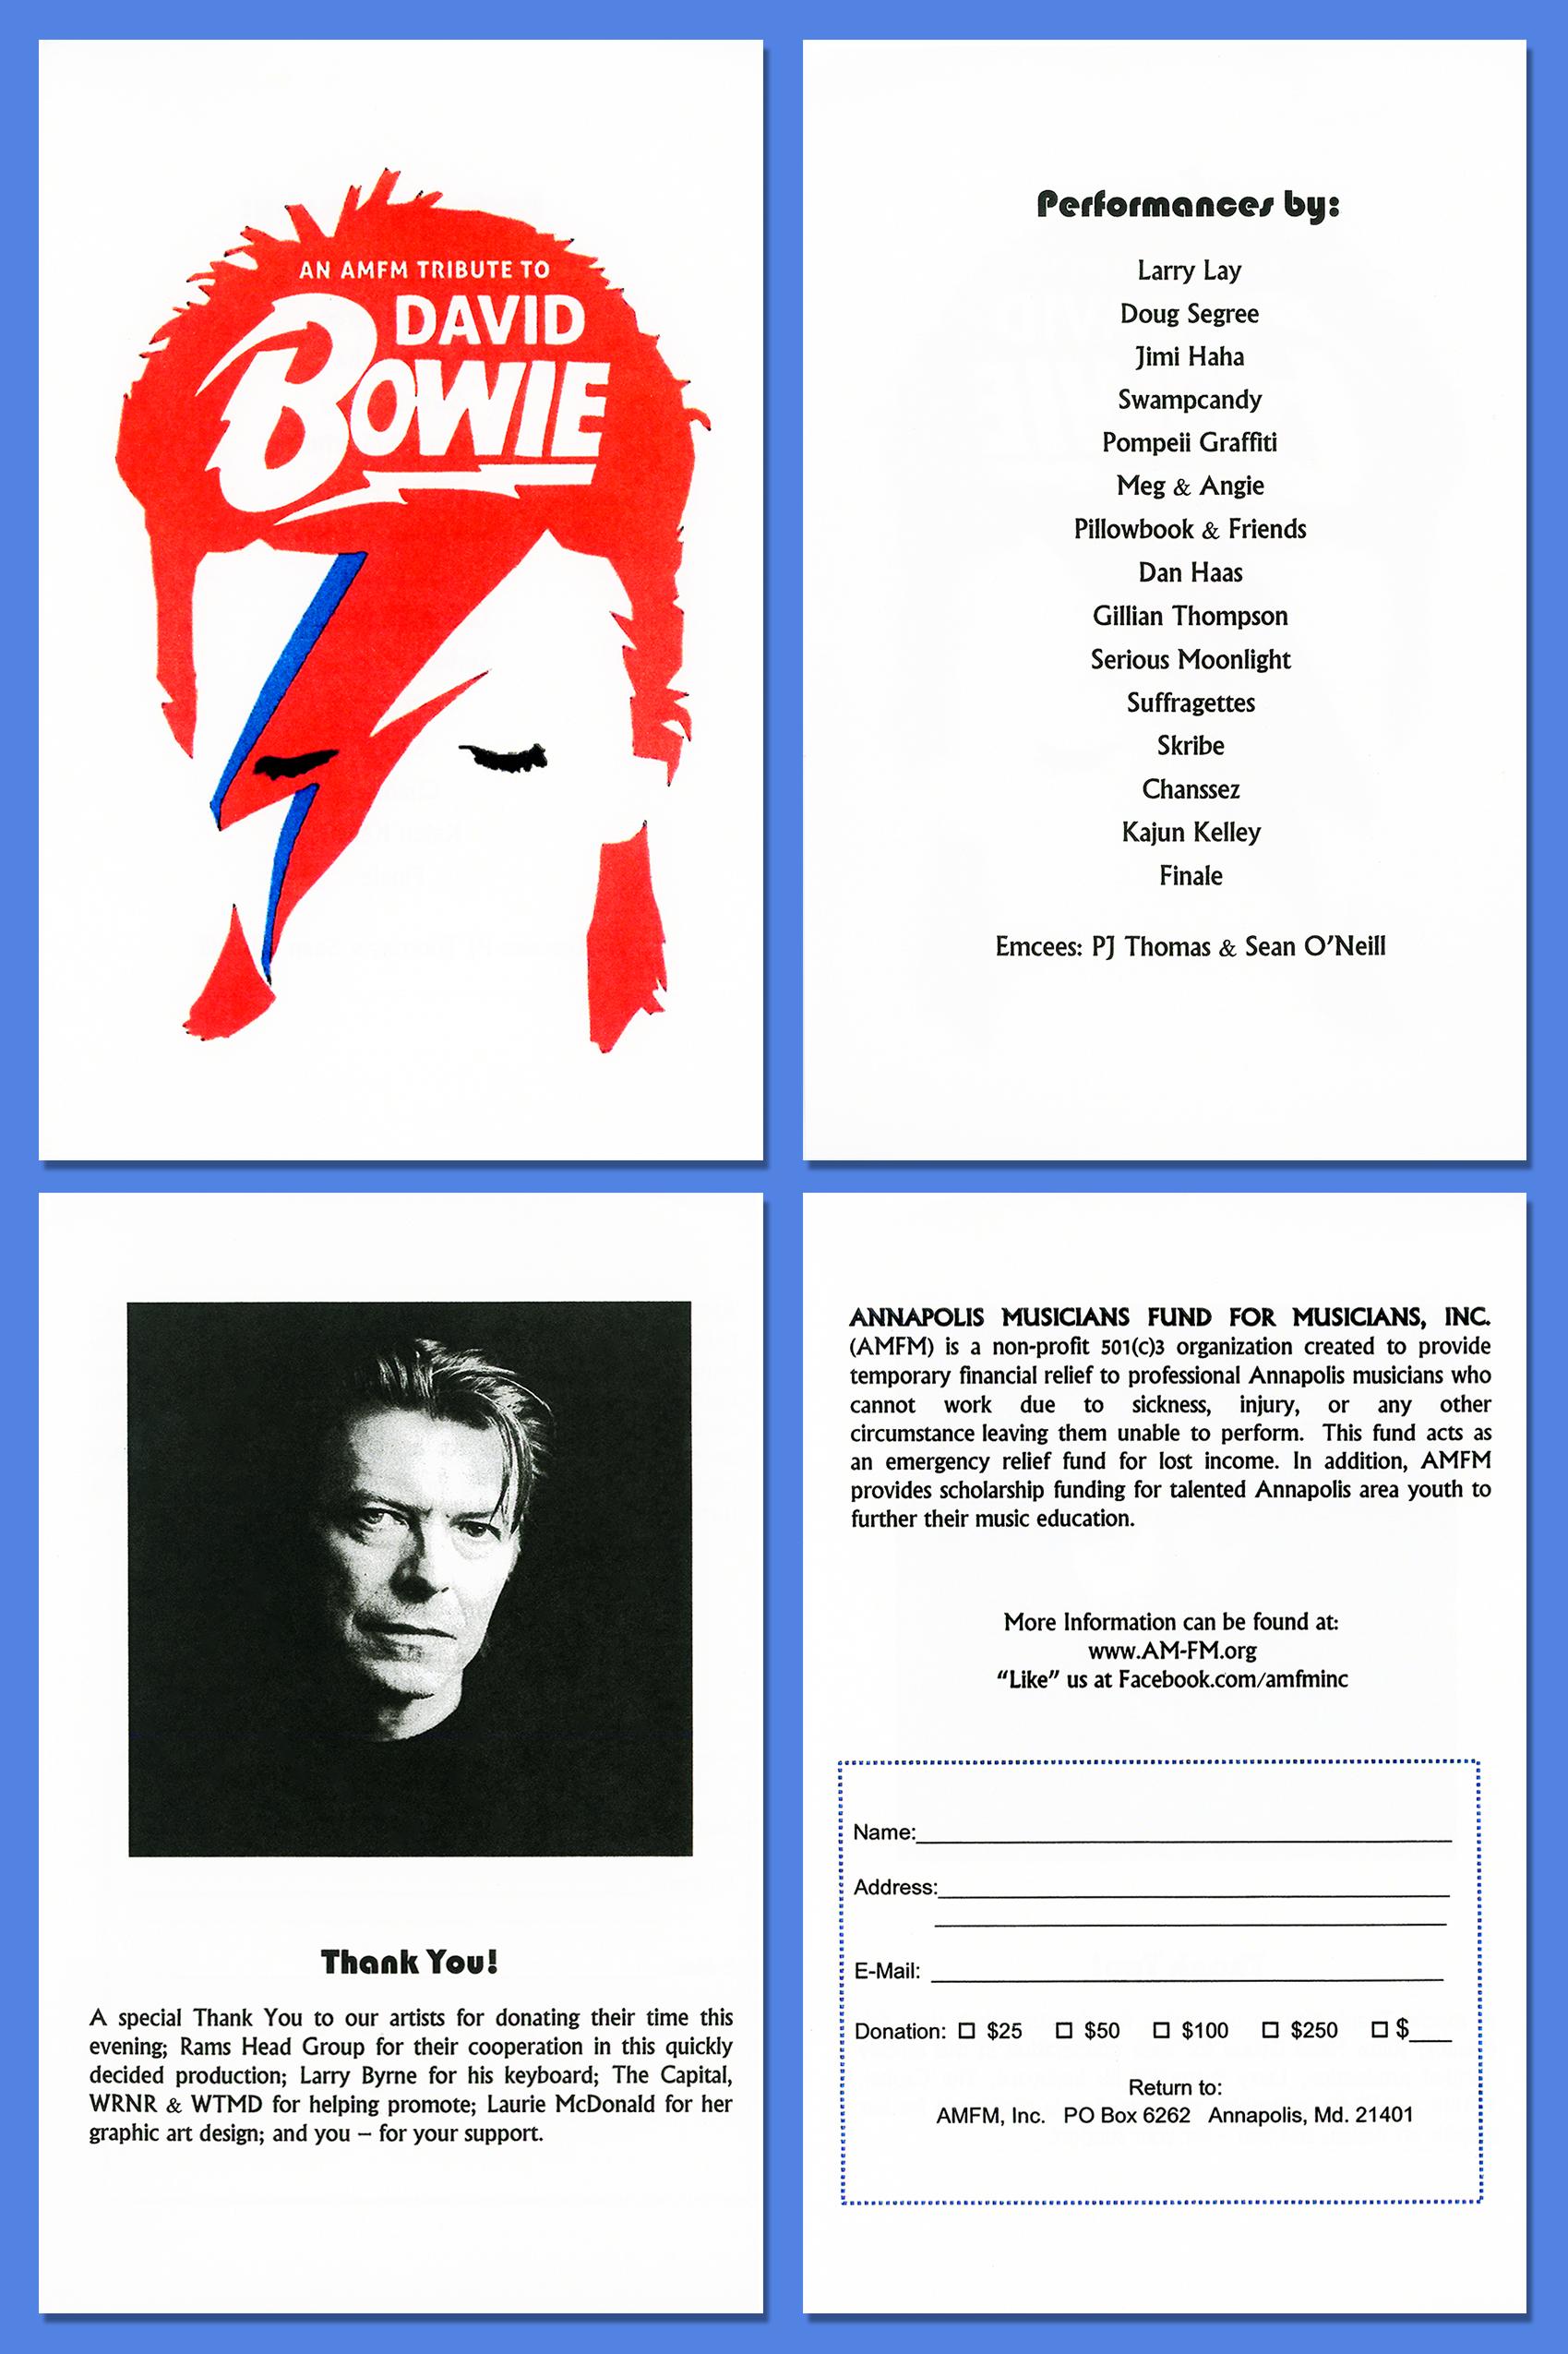 Daivd Bowie Tribute Show Program Layout